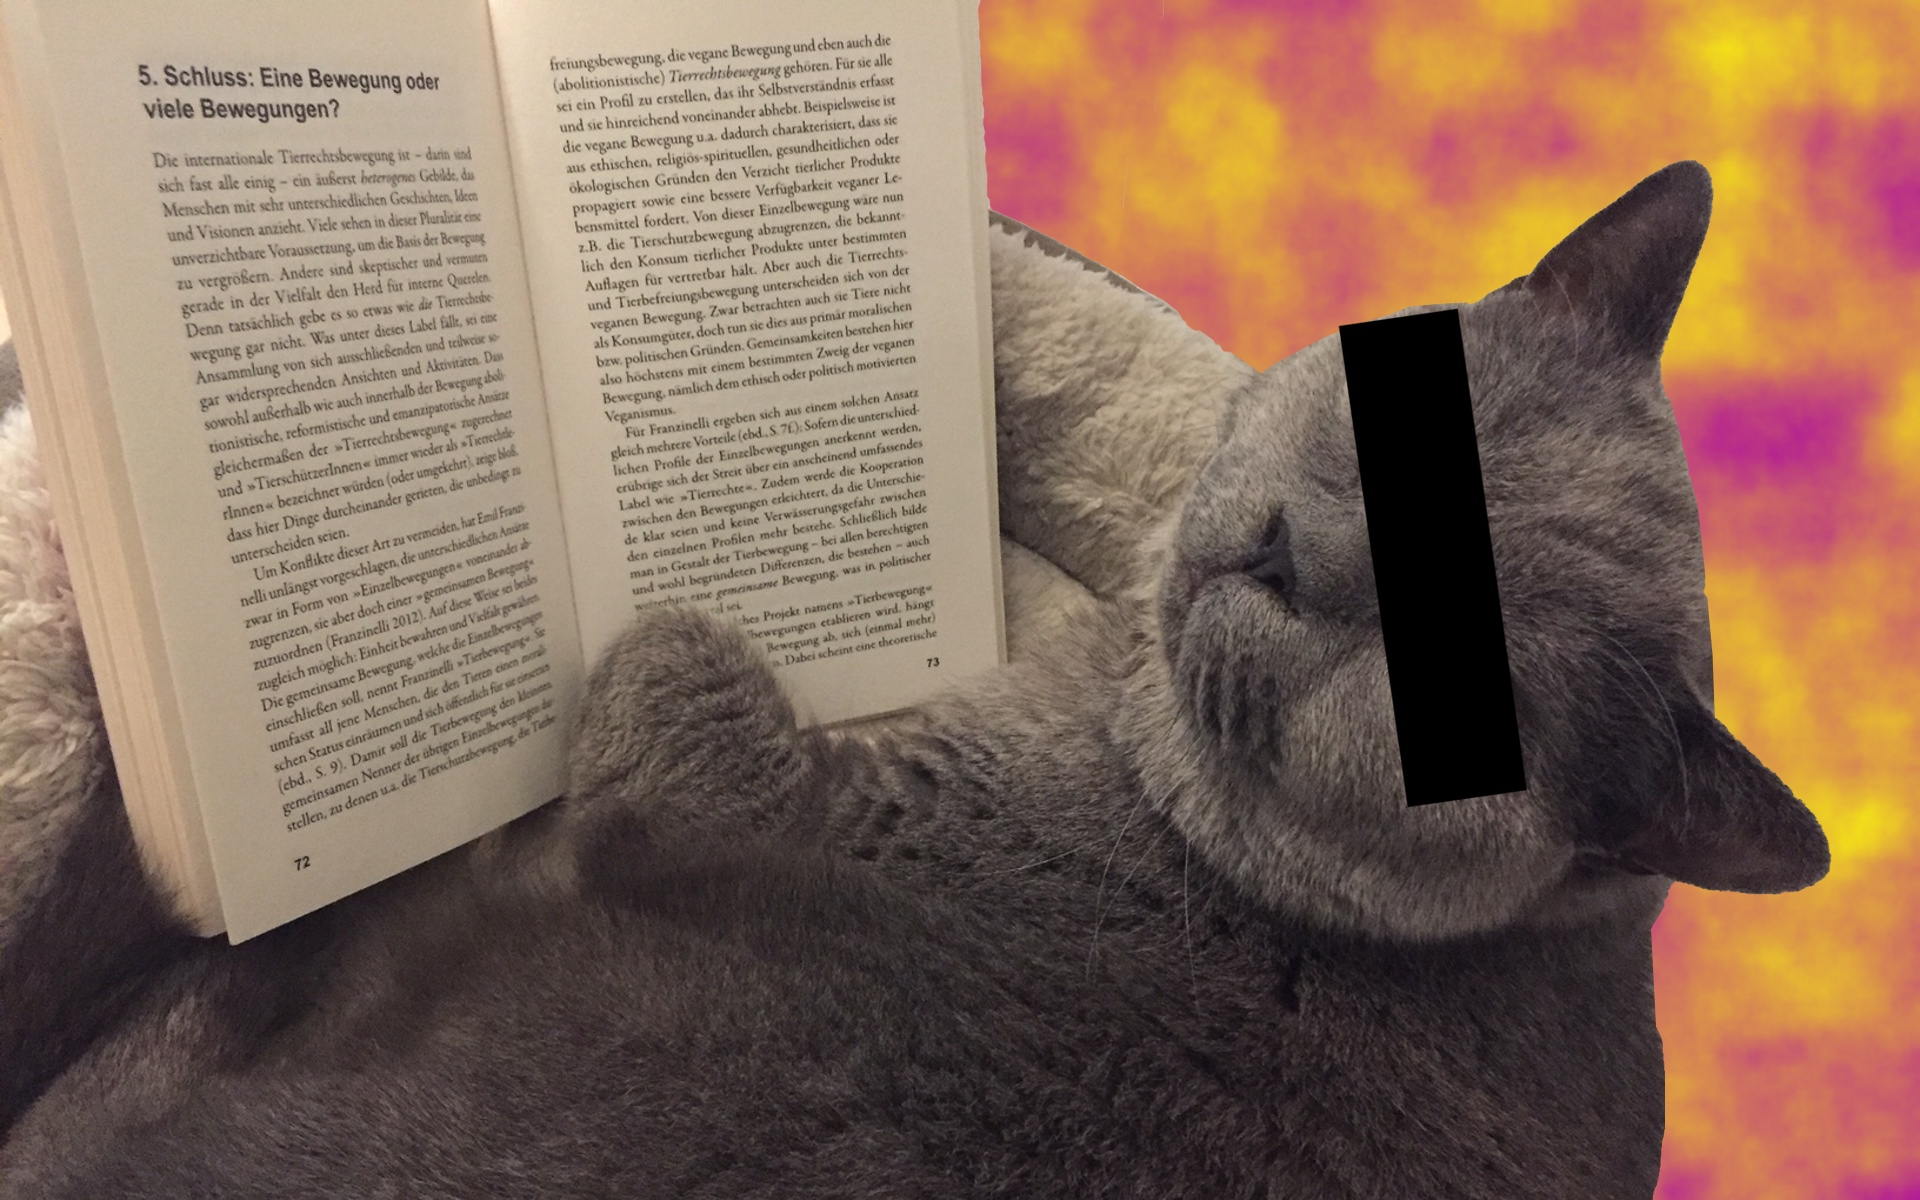 """Tierrechtsbewegung – Geschichte, Theorie, Aktivismus"" – wie gut ist das Buch?"